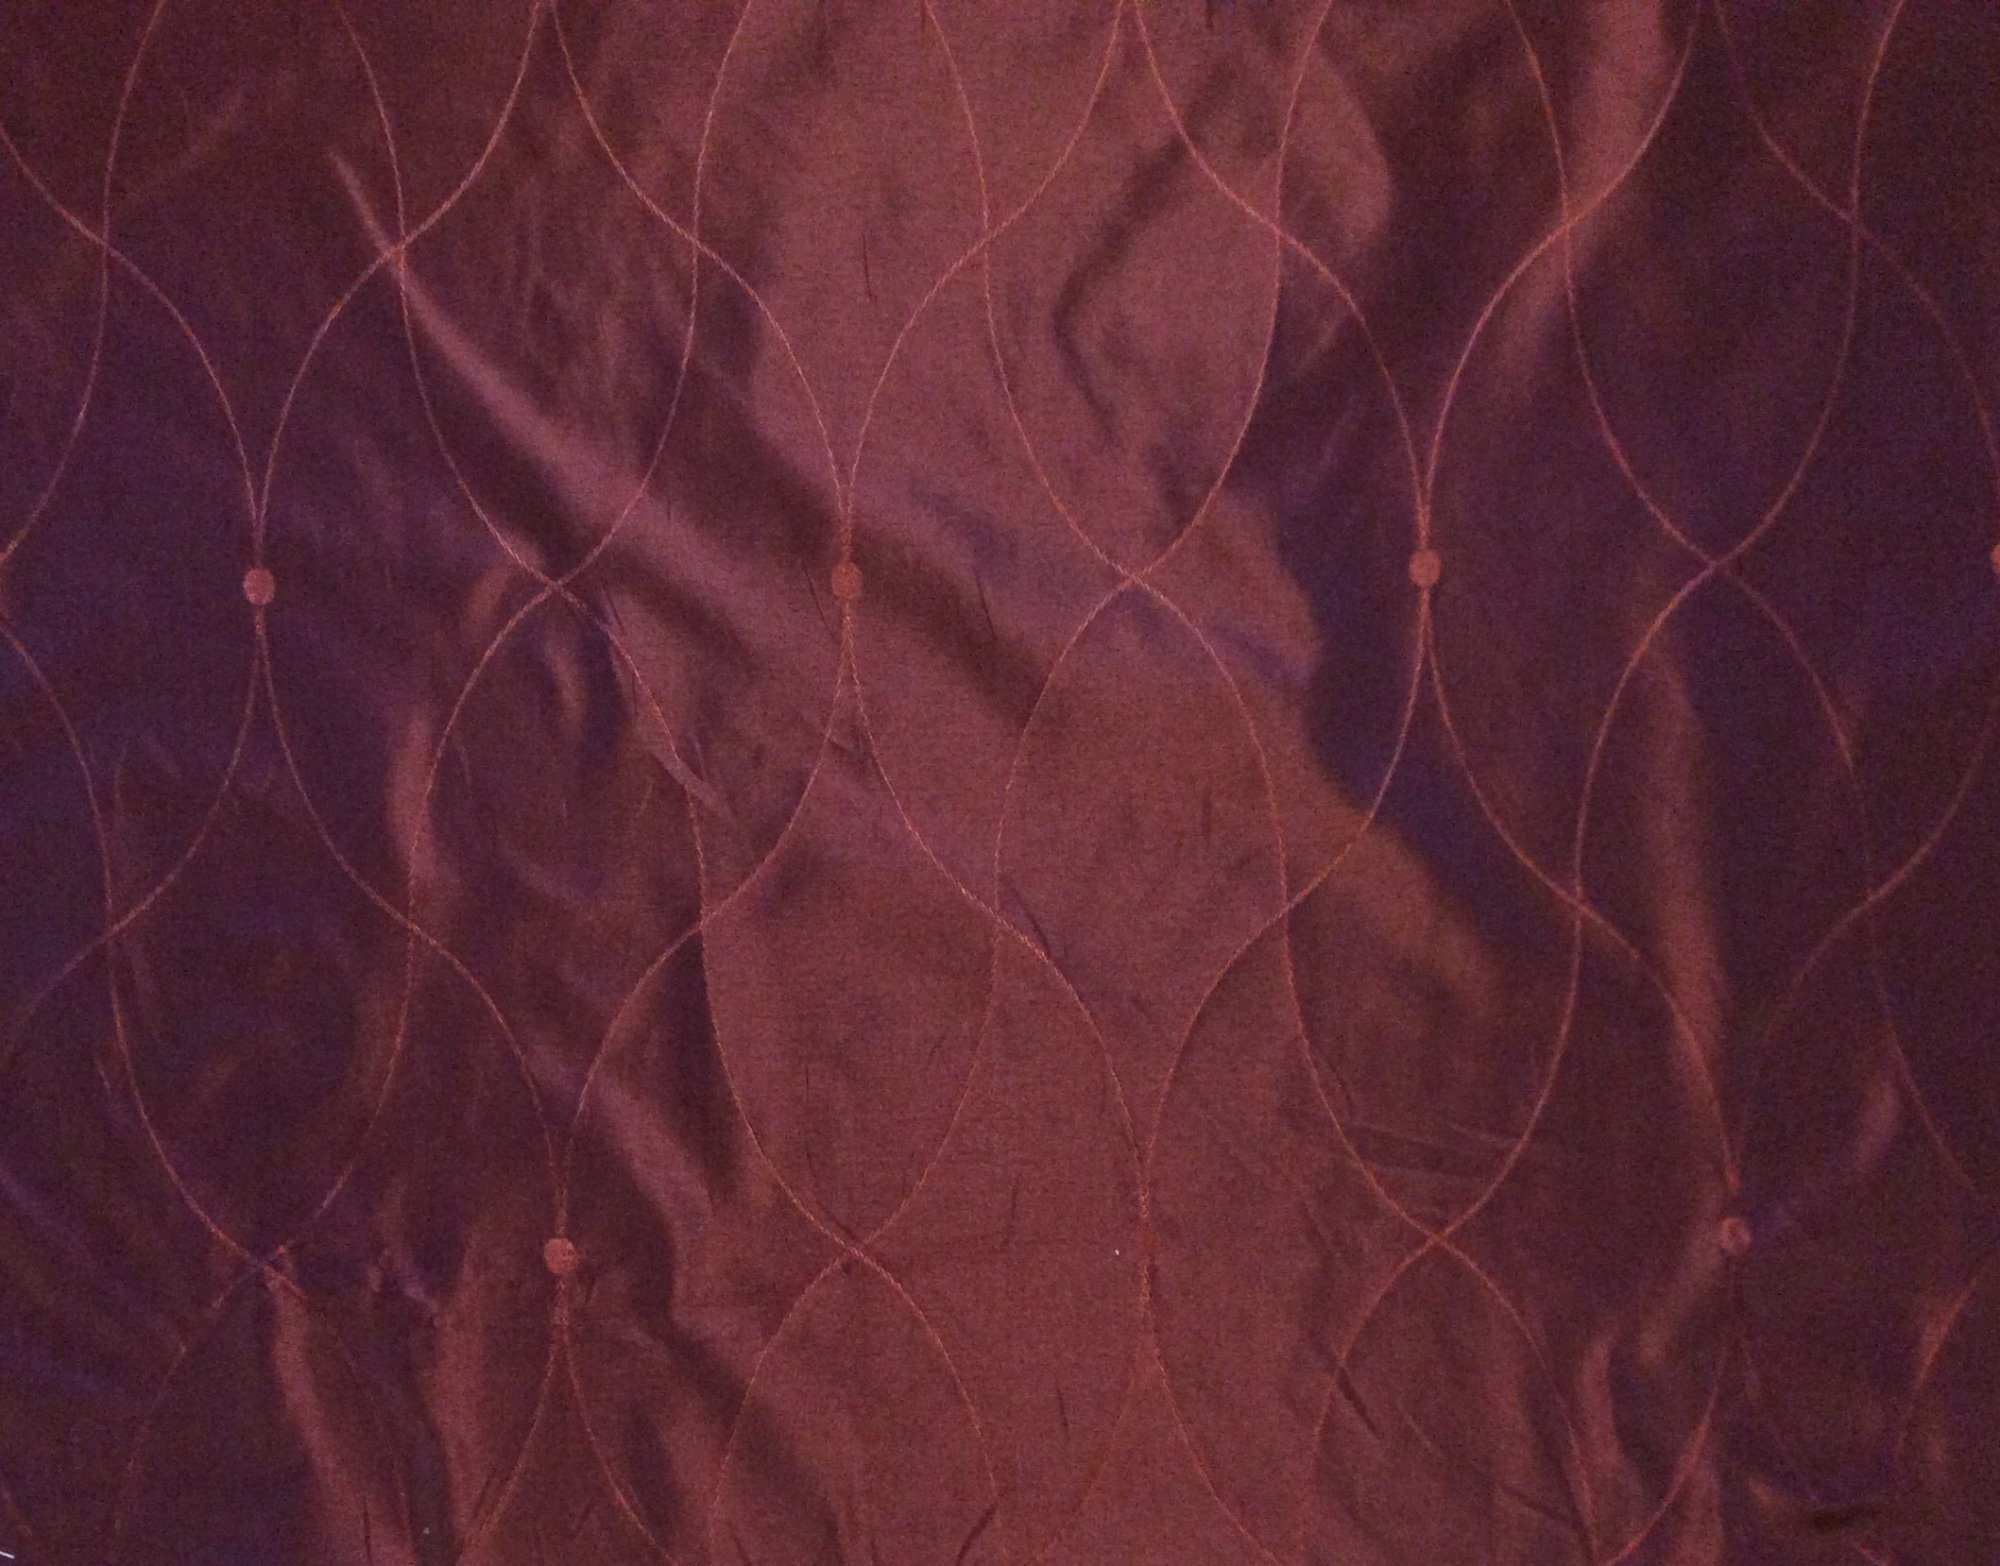 Clarence House SILK Heavy Jacquard Saint Laurent Merlot Reversible Italy Woven Silk Taffeta Fabric Drapery Fabric Upholstery Fabric CLA998